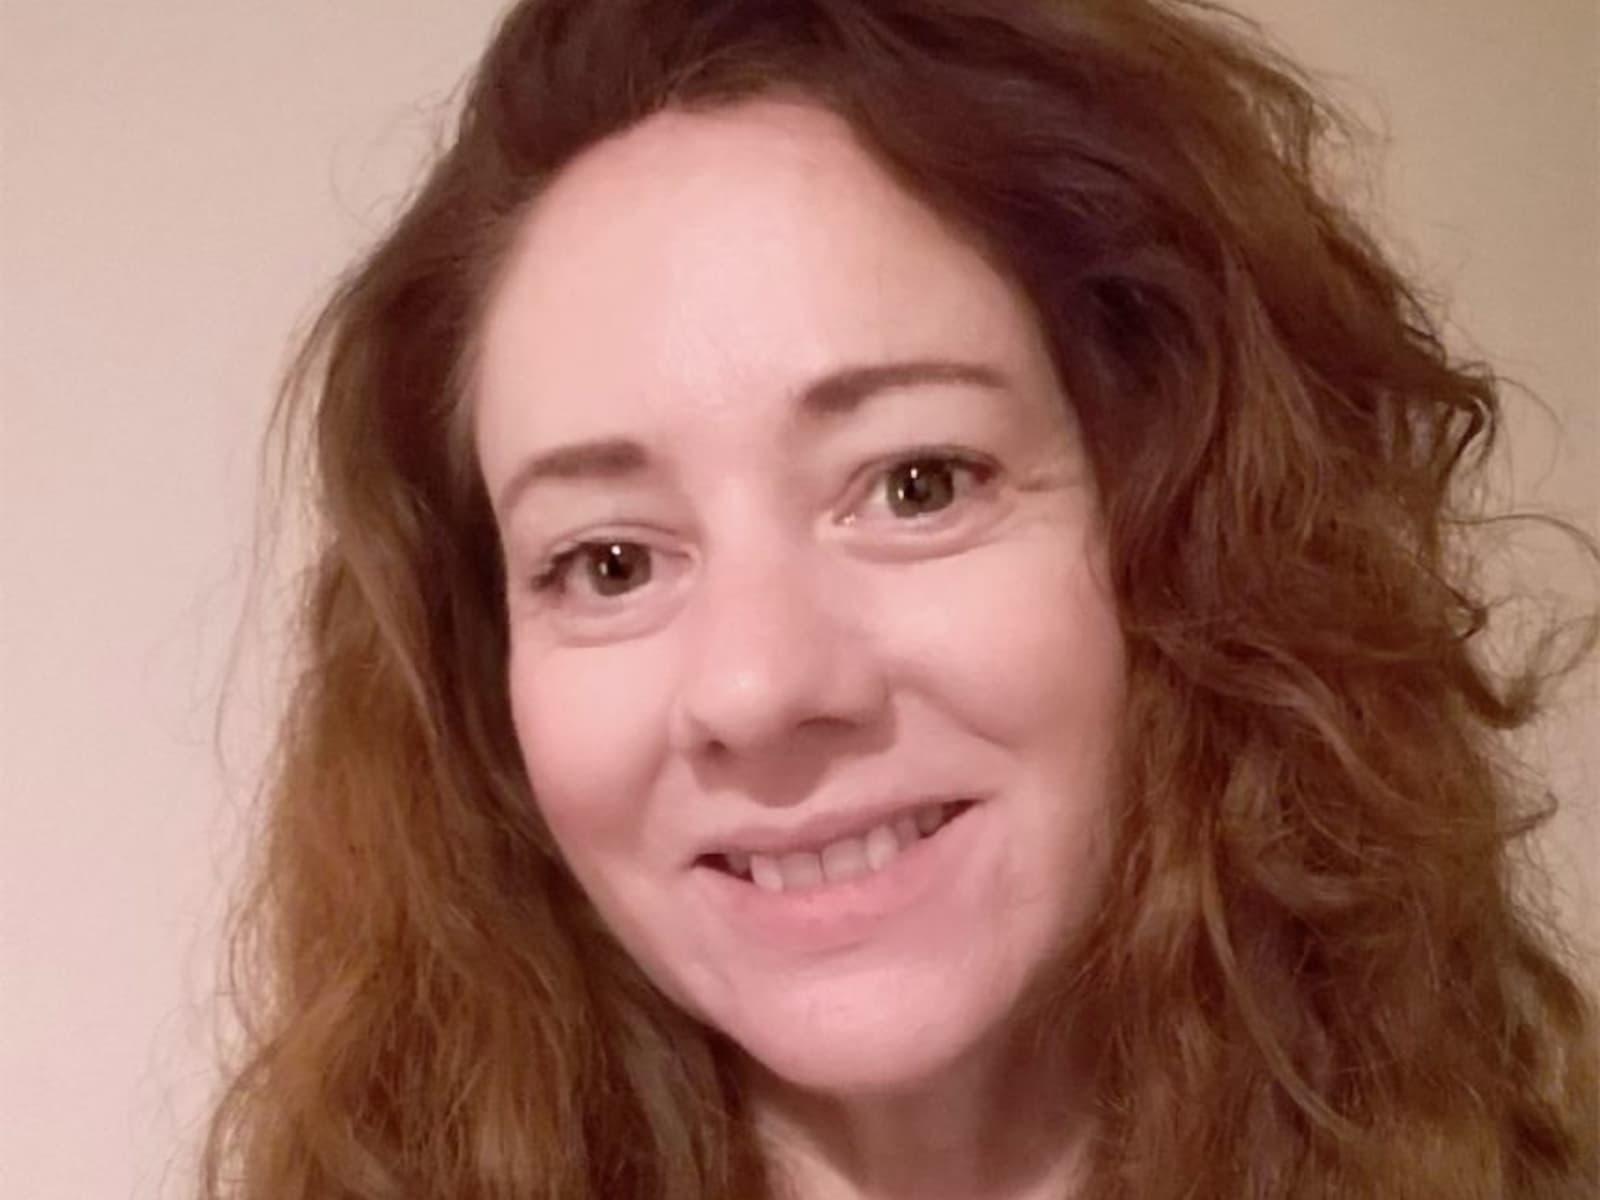 Andrea from Frinton-on-Sea, United Kingdom